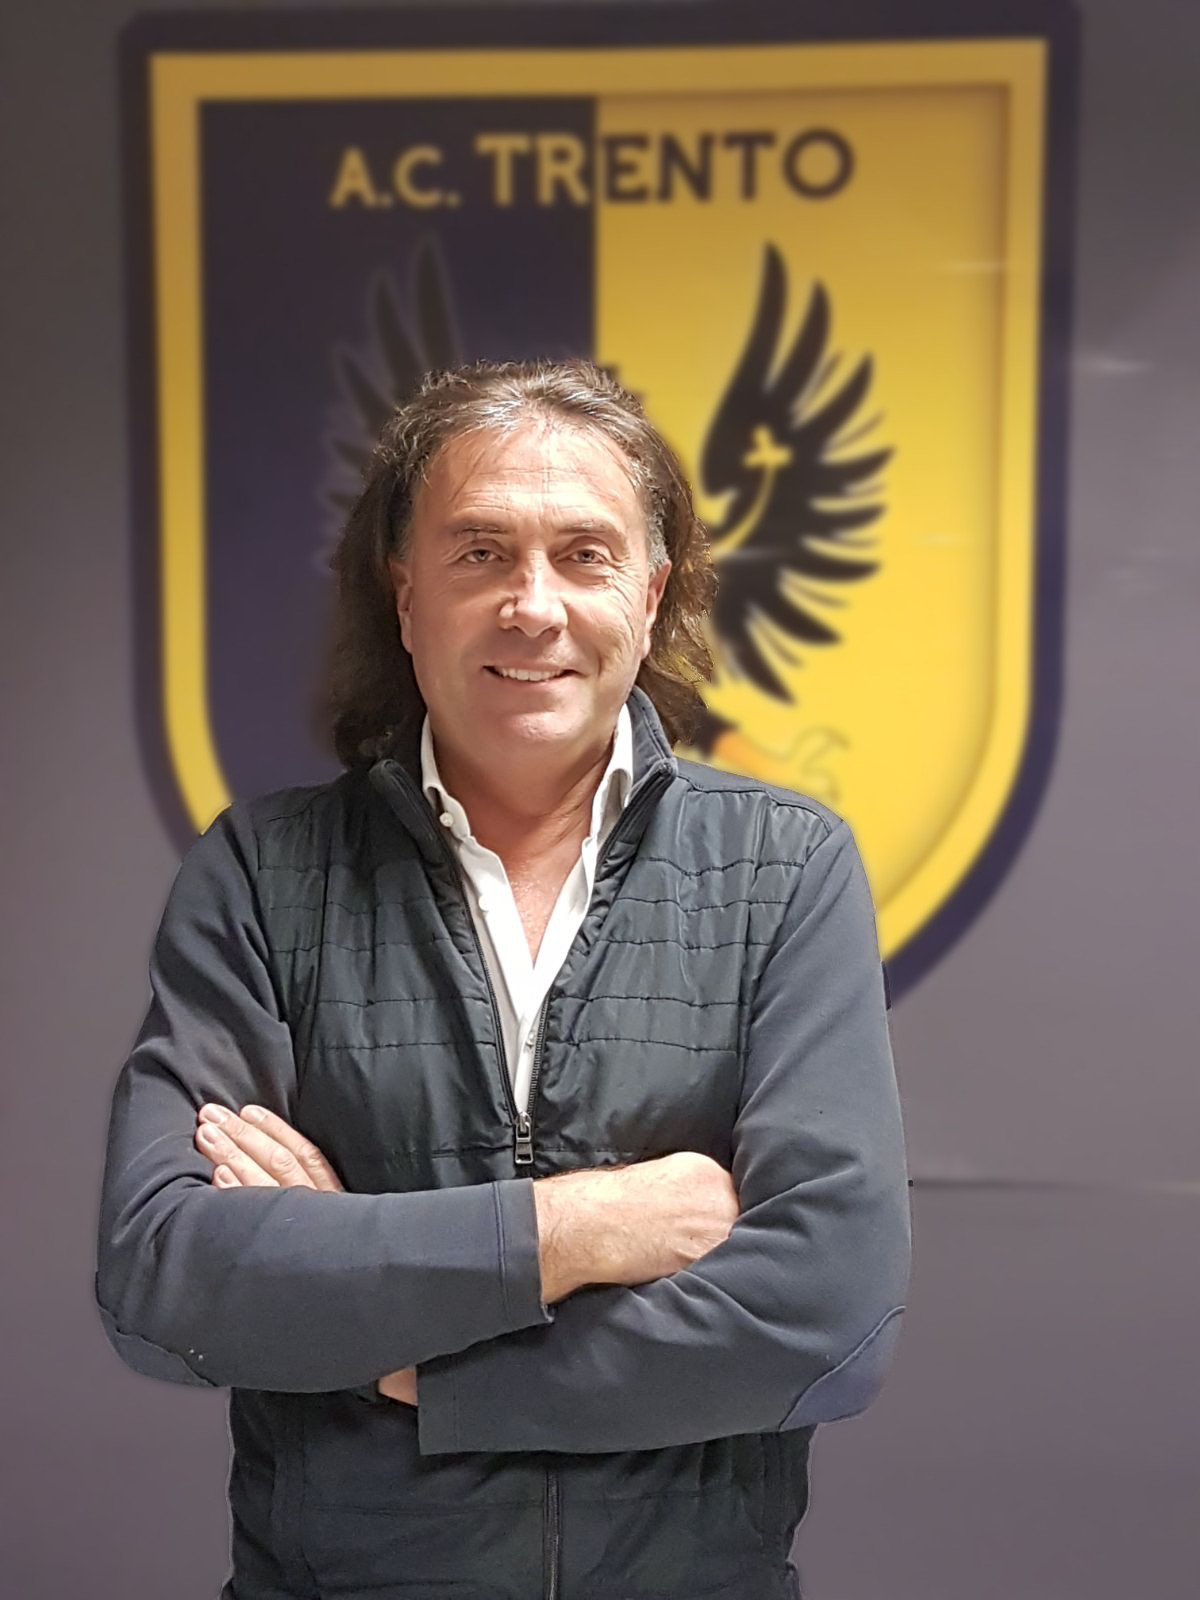 LORENZO LANER Consigliere